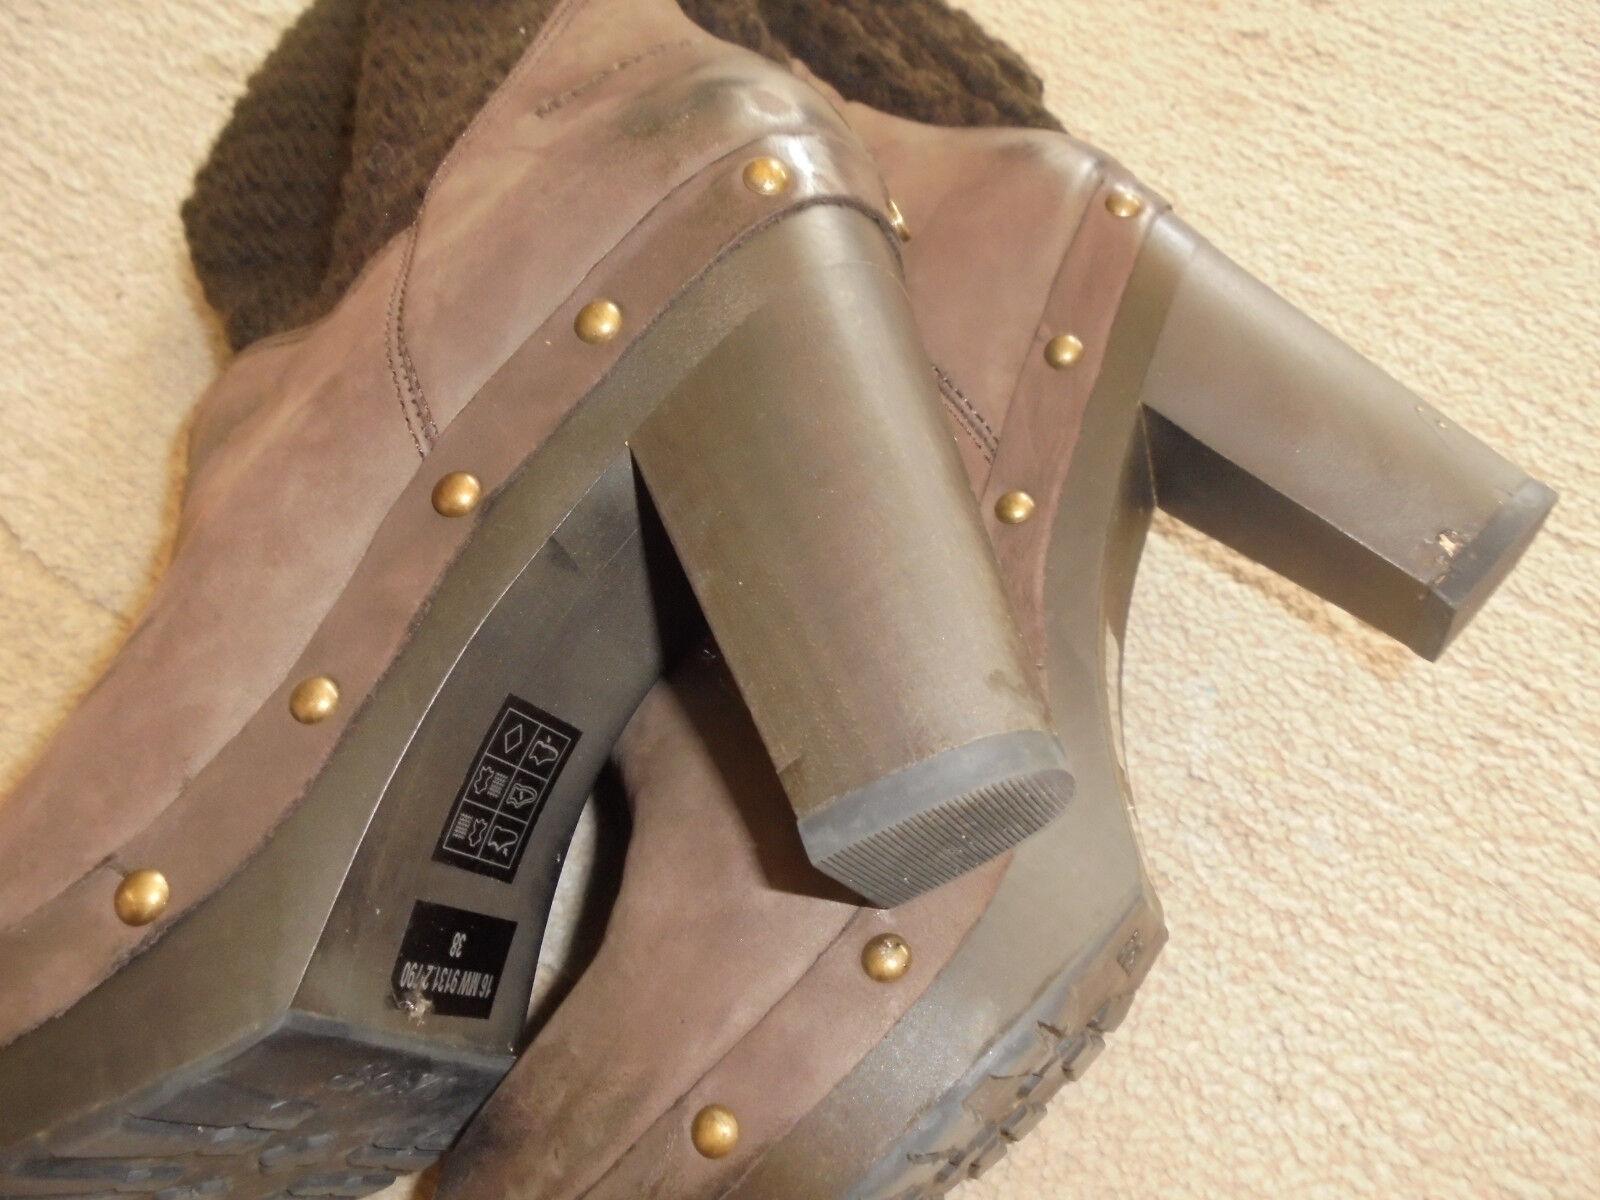 Marc o Polo MOP Damen Stiefel Boots Freizeit NP Nubuk Gr 37 38 NP Freizeit 180 Euro 2ac5c8